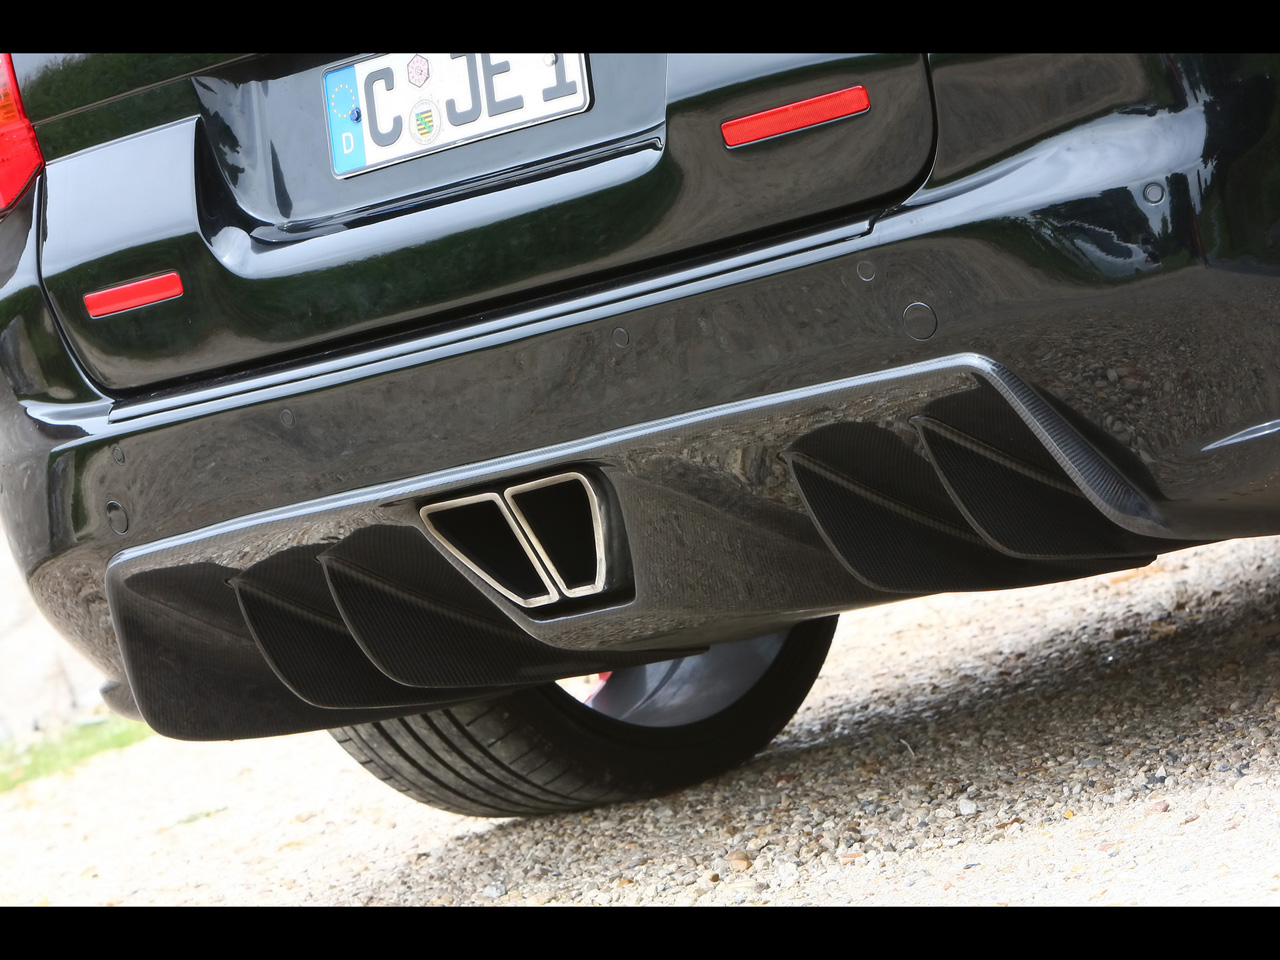 2010-Enco-Gladiator-700-Porsche-Cayenne-GT-Biturbo-Rear-Diffuser-1280x960.jpg